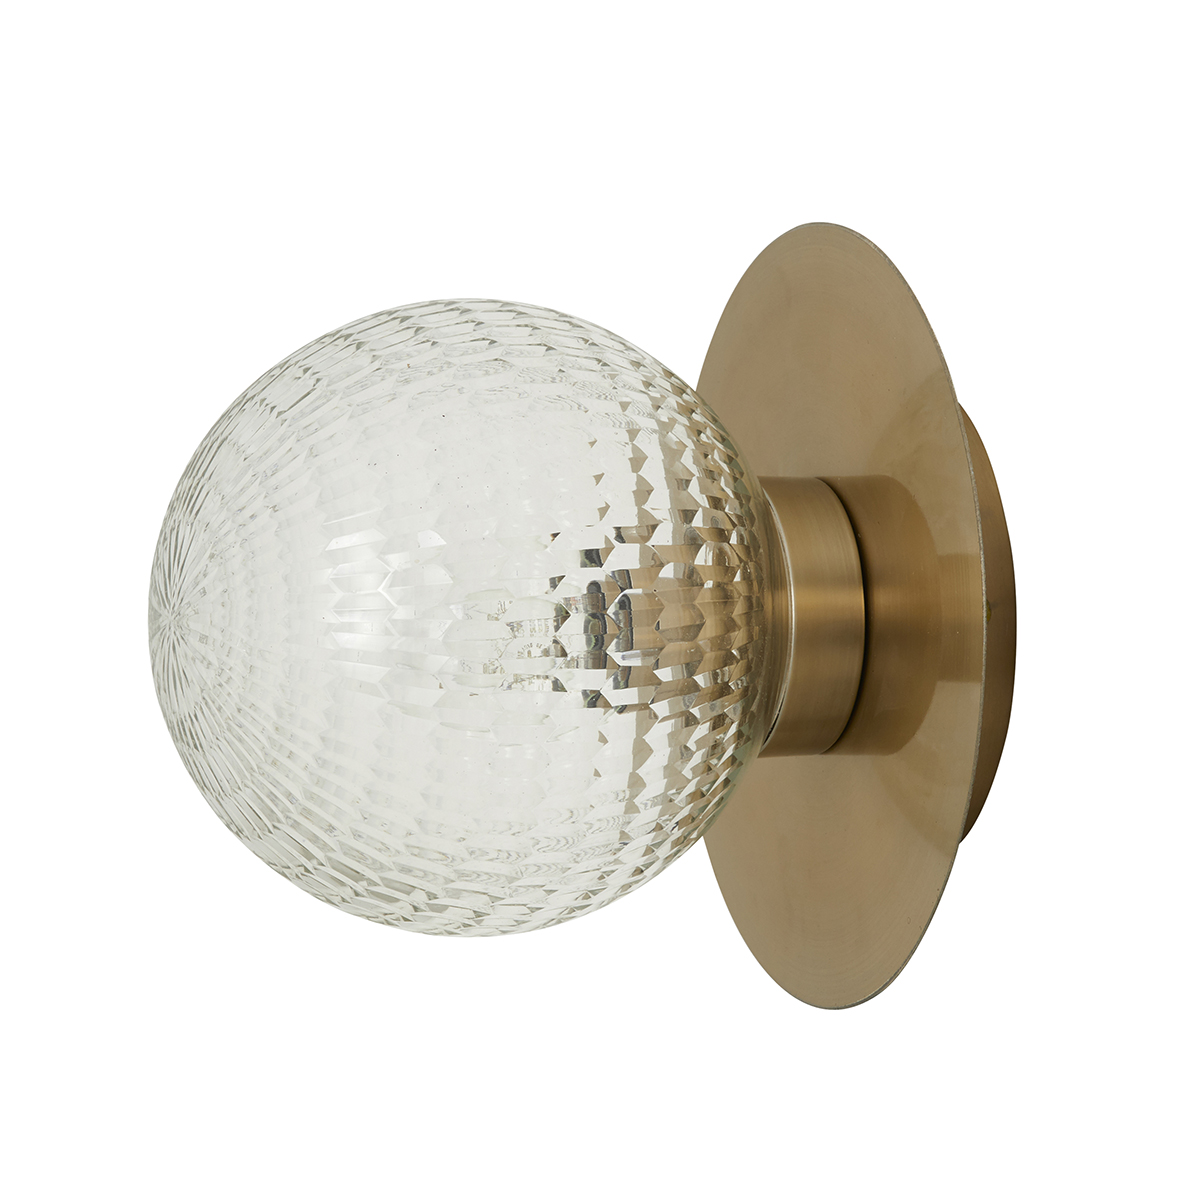 Vegglampe Anona